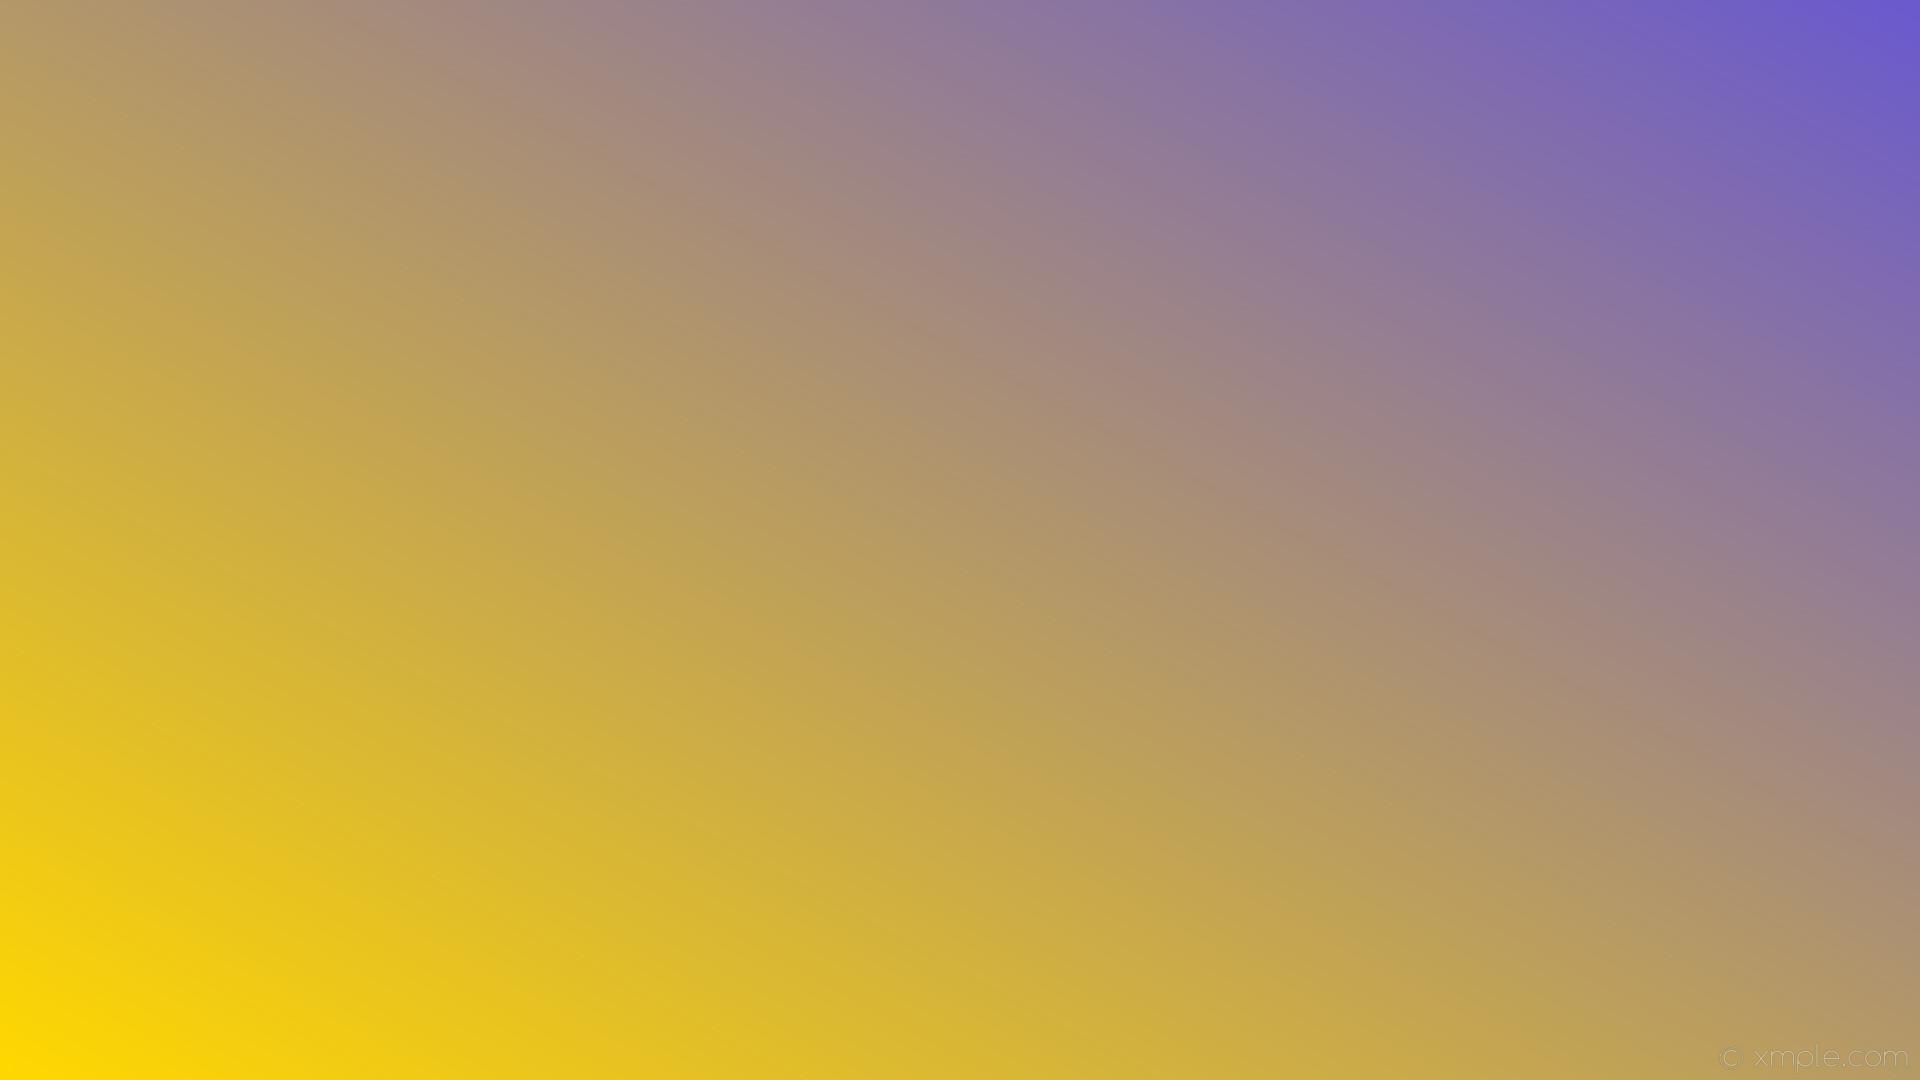 wallpaper gradient yellow purple linear slate blue gold #6a5acd #ffd700 30°